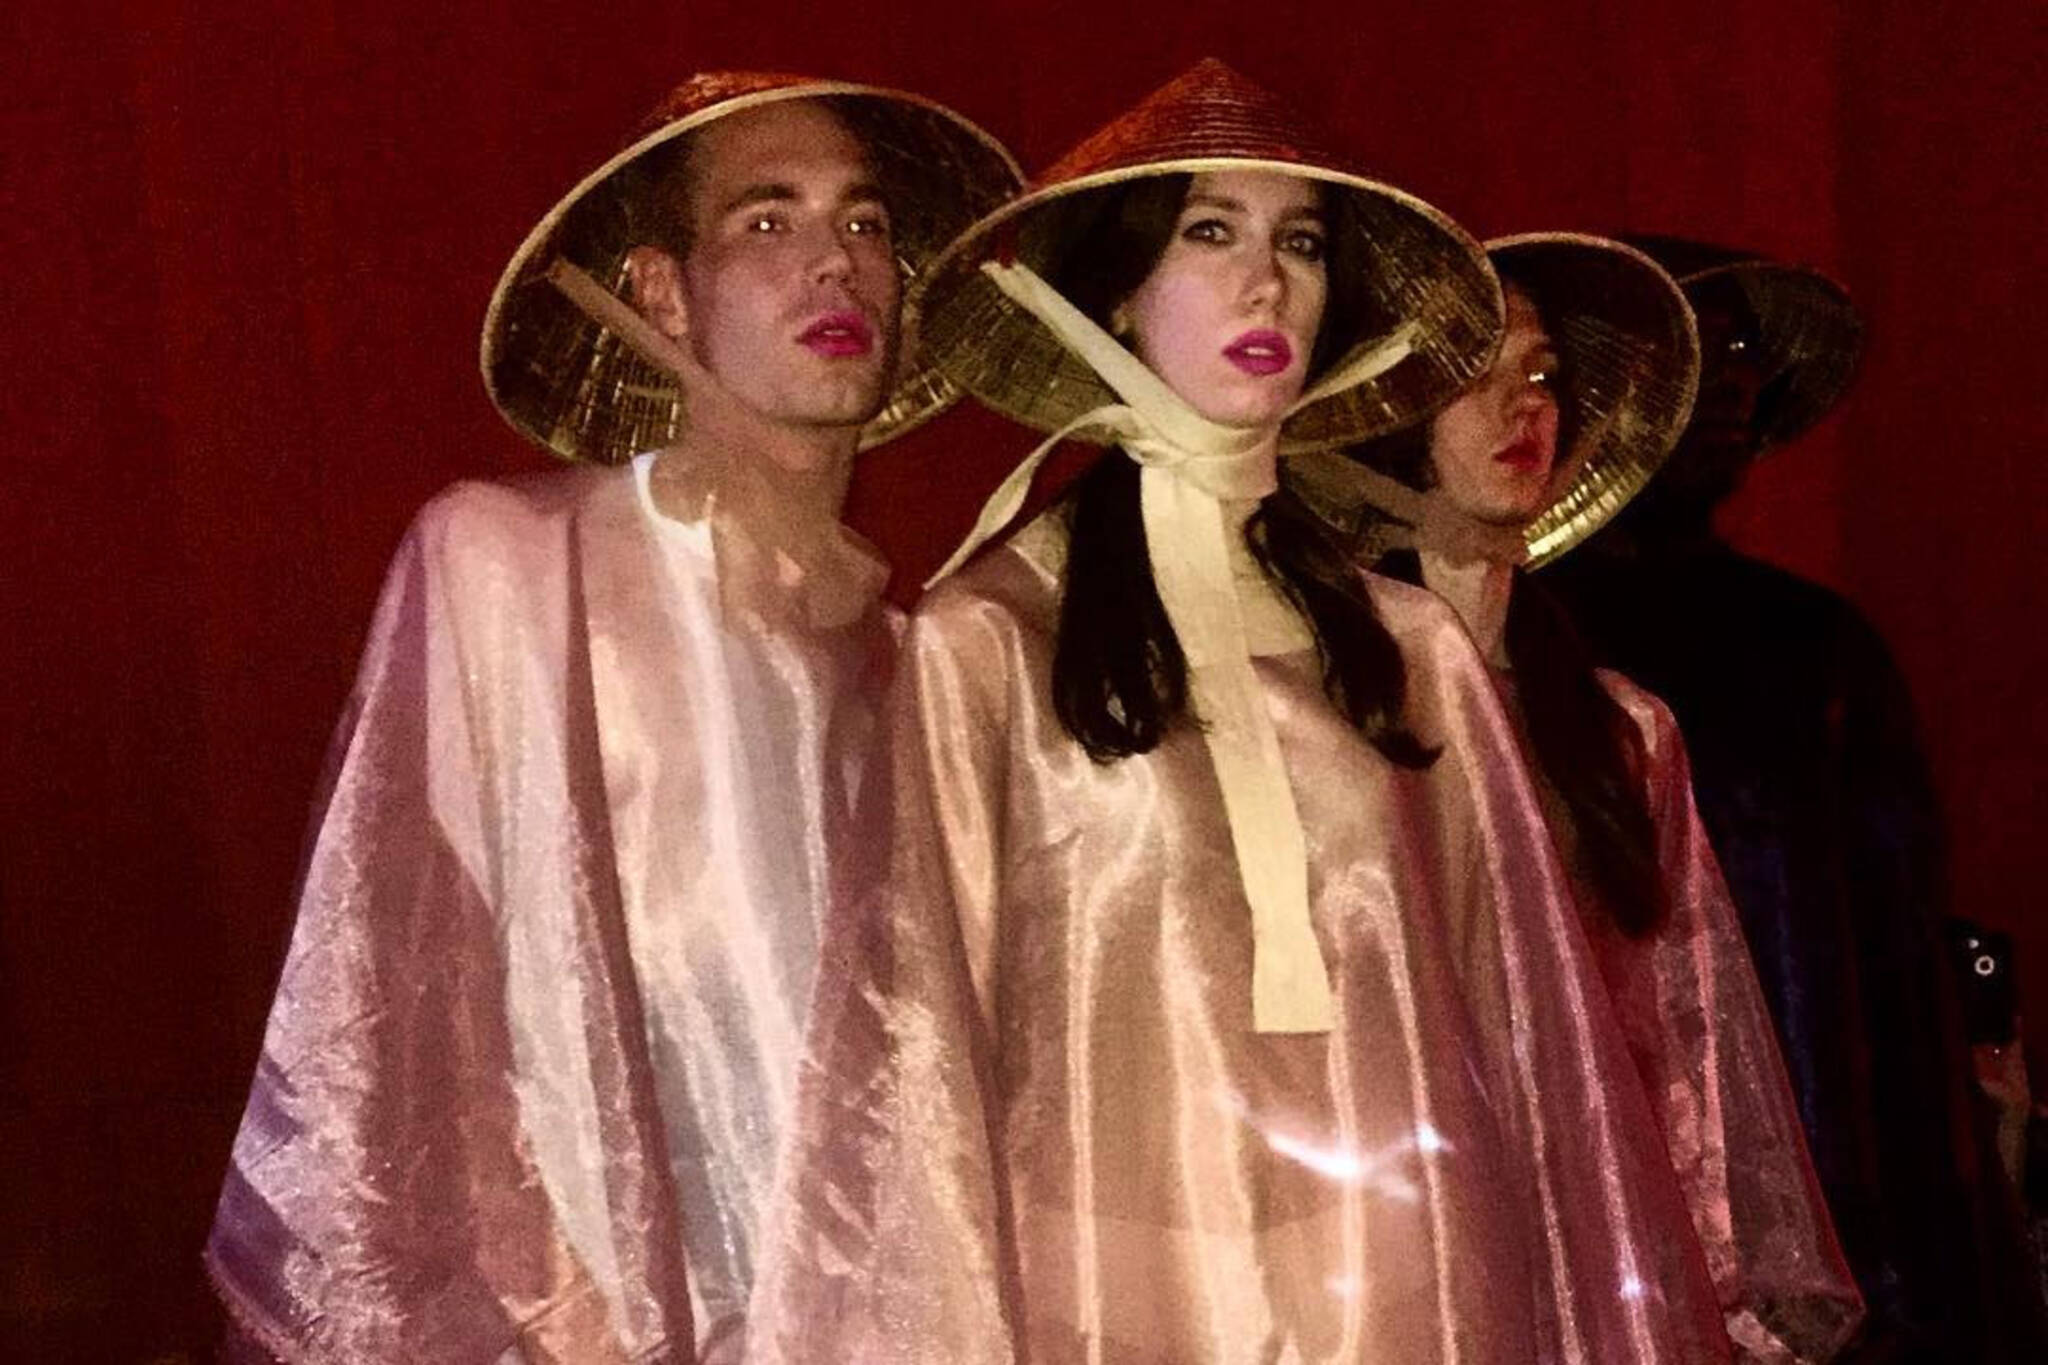 AGO racist costumes